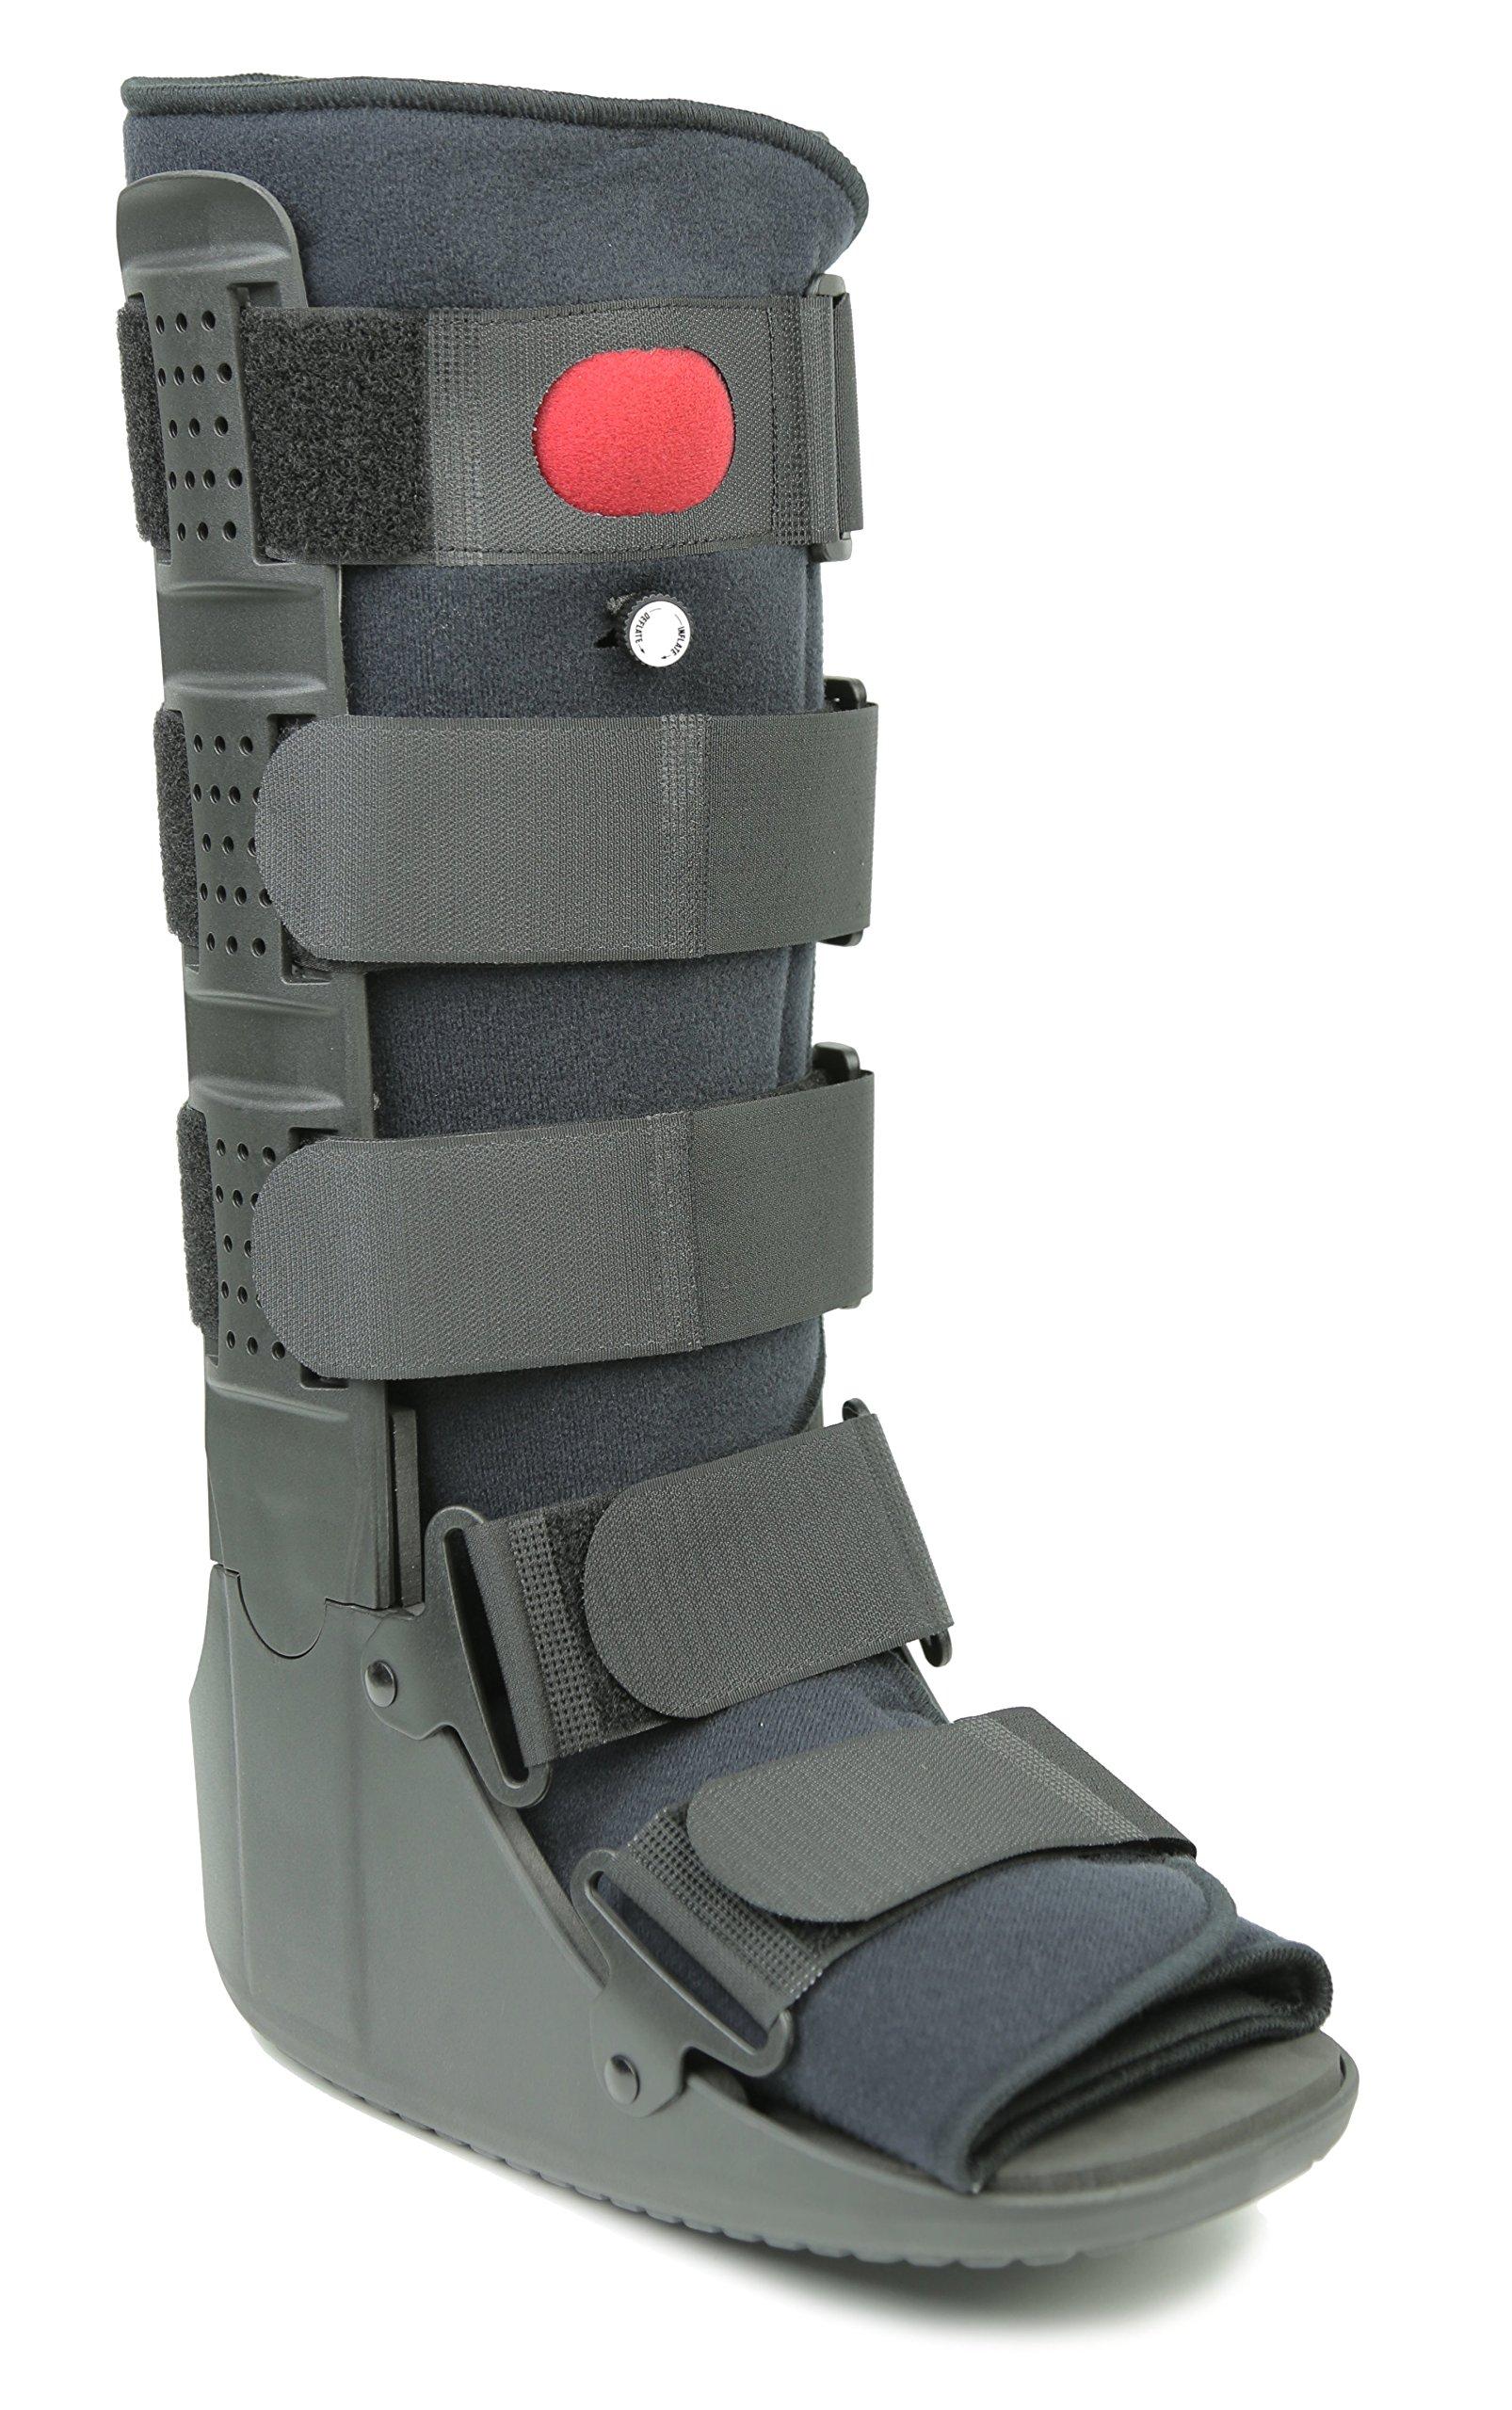 Mars Wellness Premium Tall Air Cam Walker Fracture Ankle/Foot Stabilizer Boot - Medium